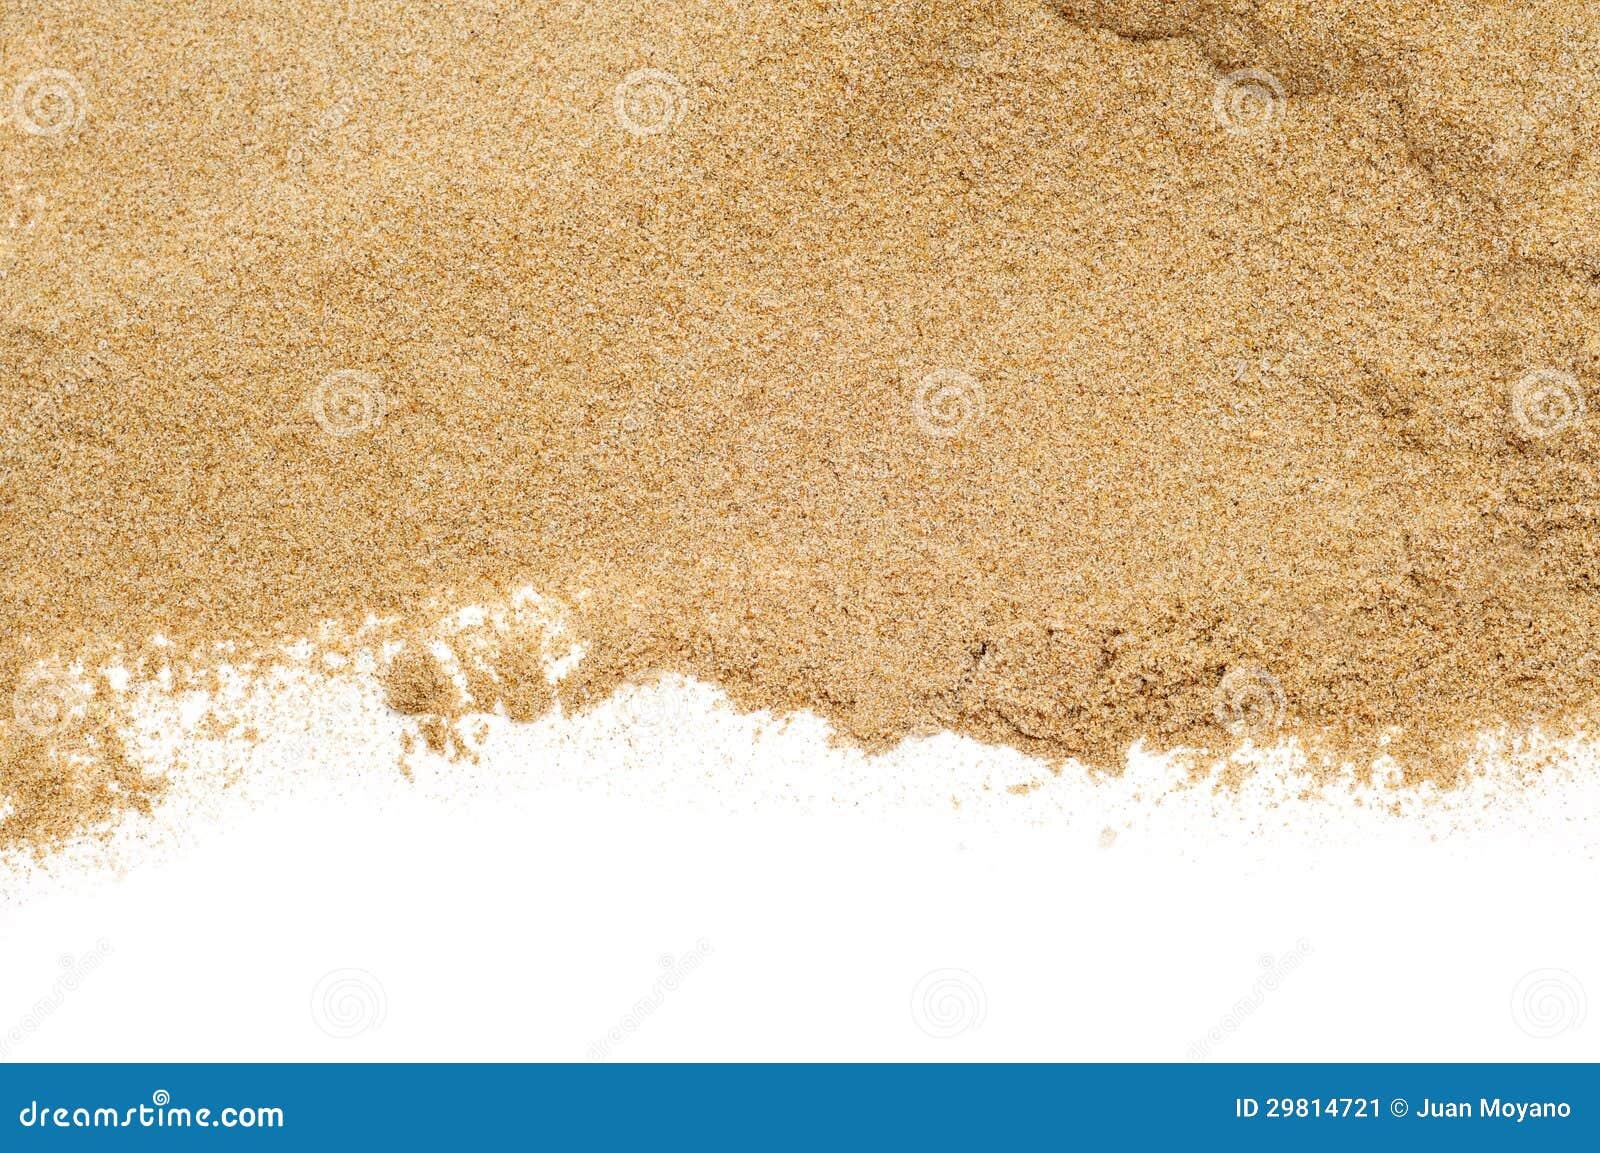 Sand Stock Image - Image: 29814721